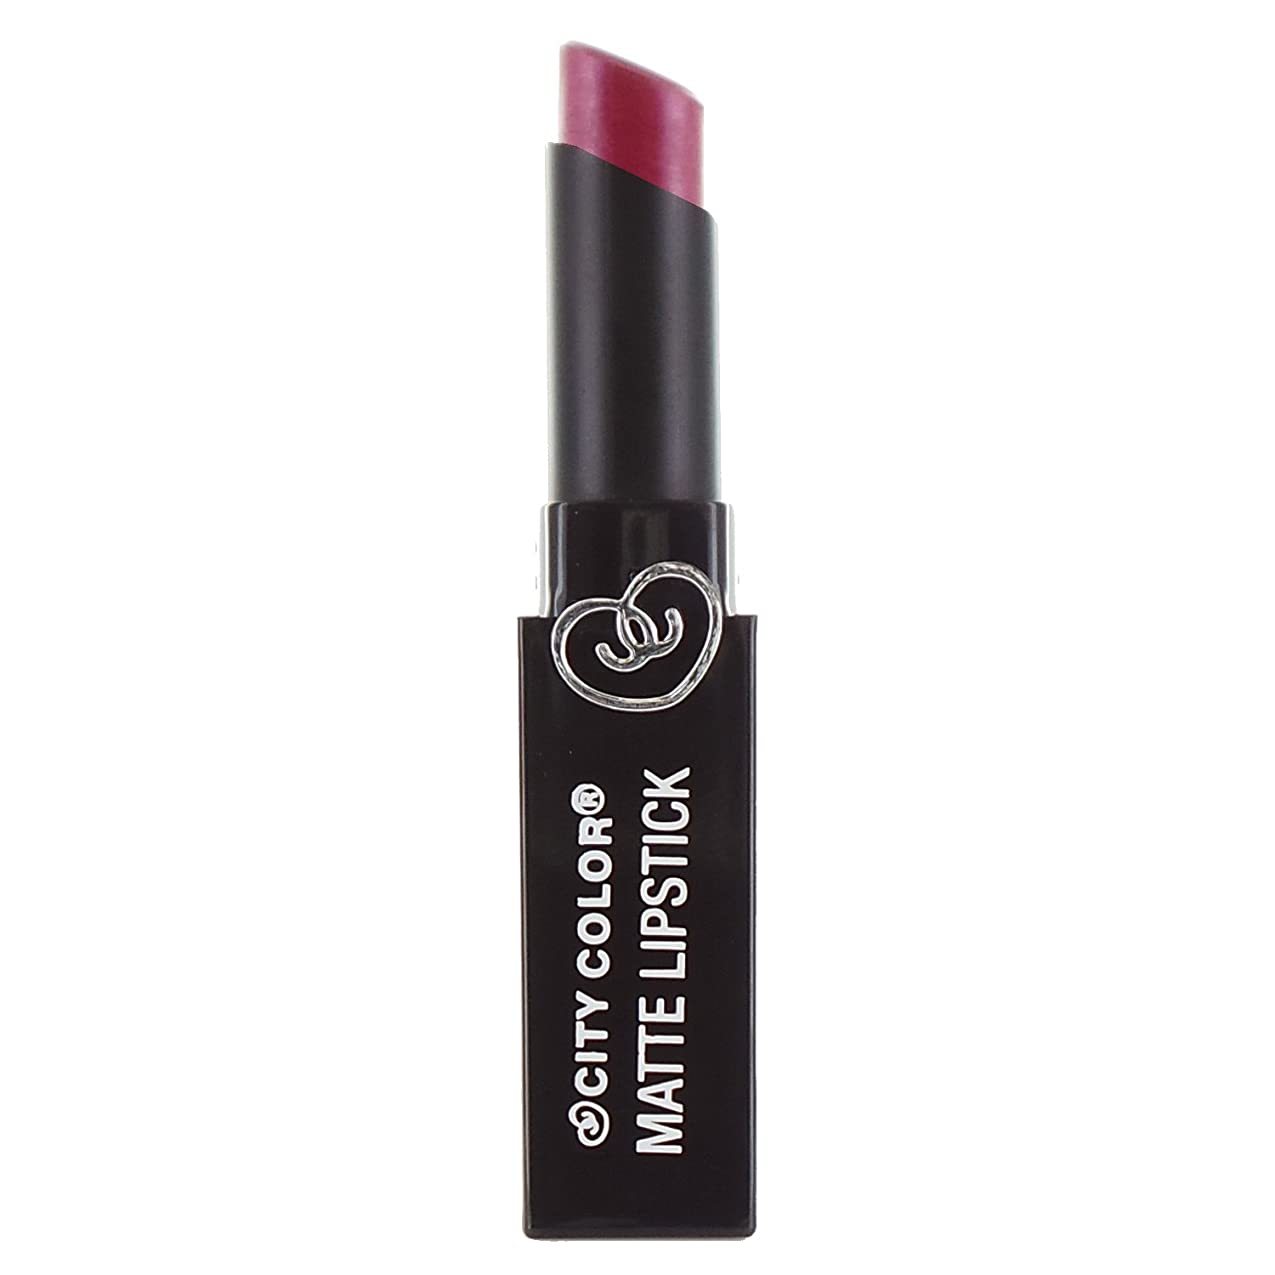 年金受給者農奴学習者CITY COLOR Matte Lipstick L0050 - Shimmer Rose (並行輸入品)